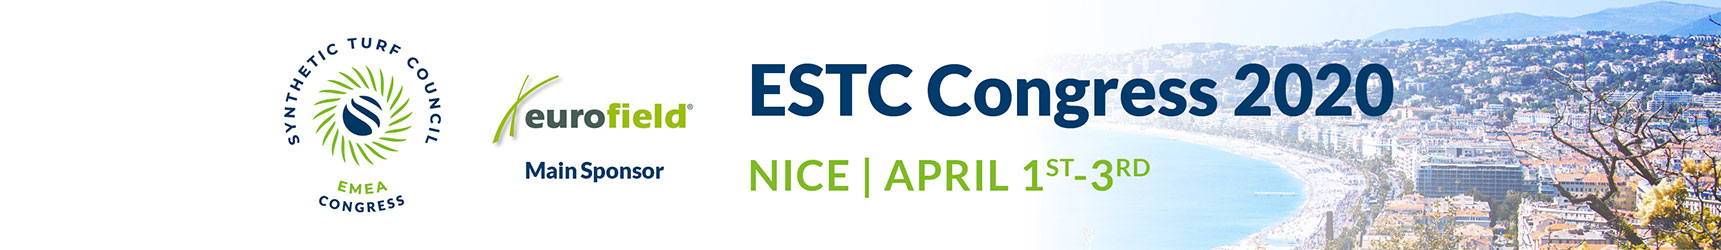 ESTC Congress 2002, Nice